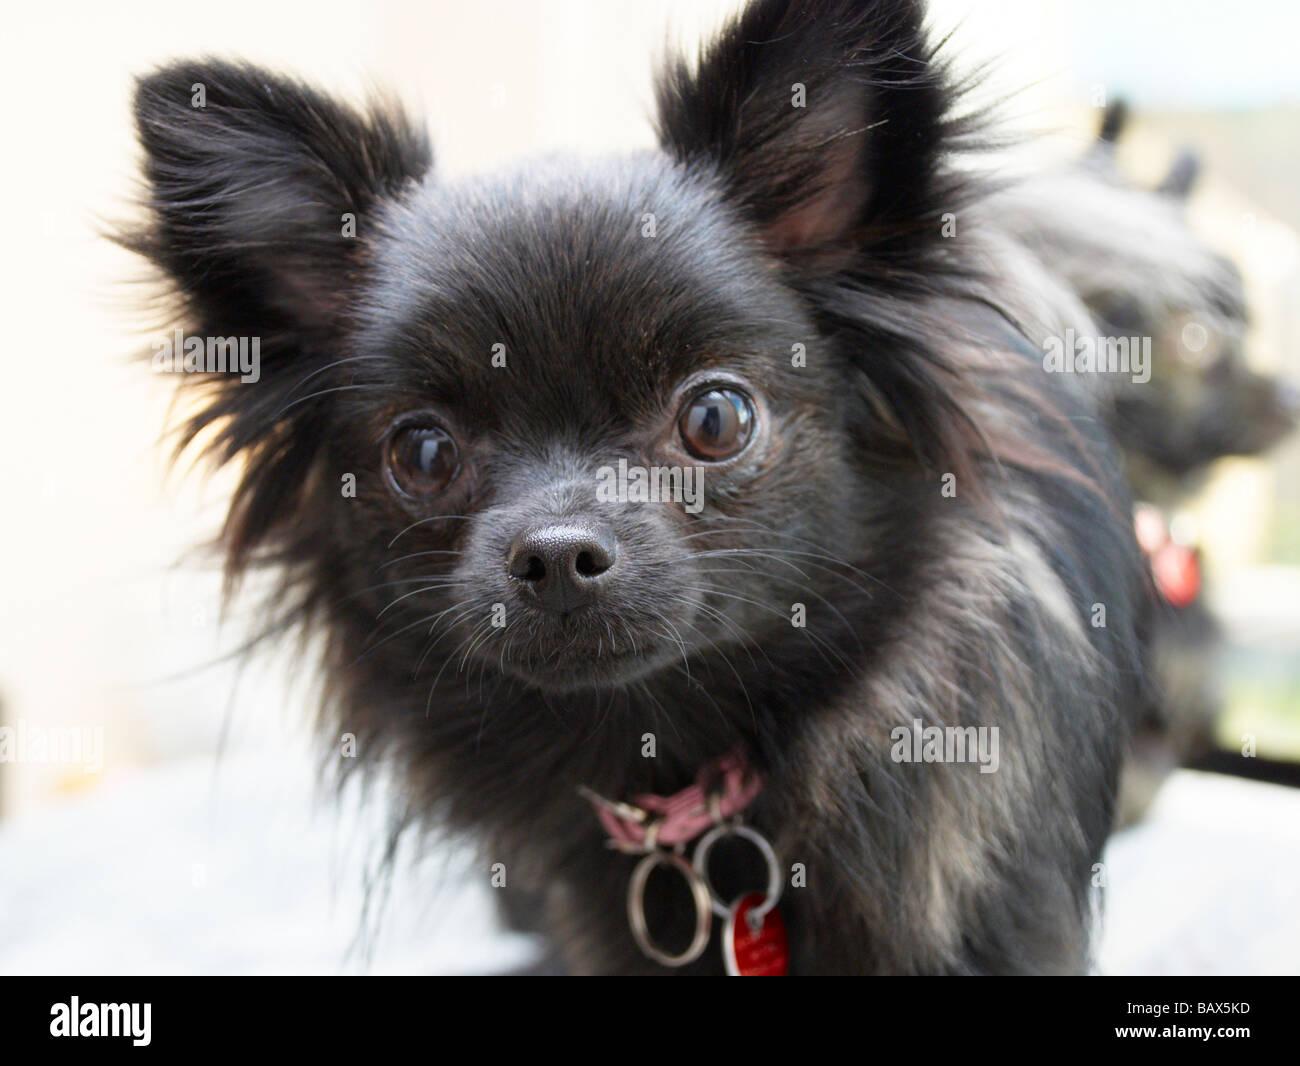 Black Pomeranian Imágenes De Stock & Black Pomeranian Fotos De Stock ...